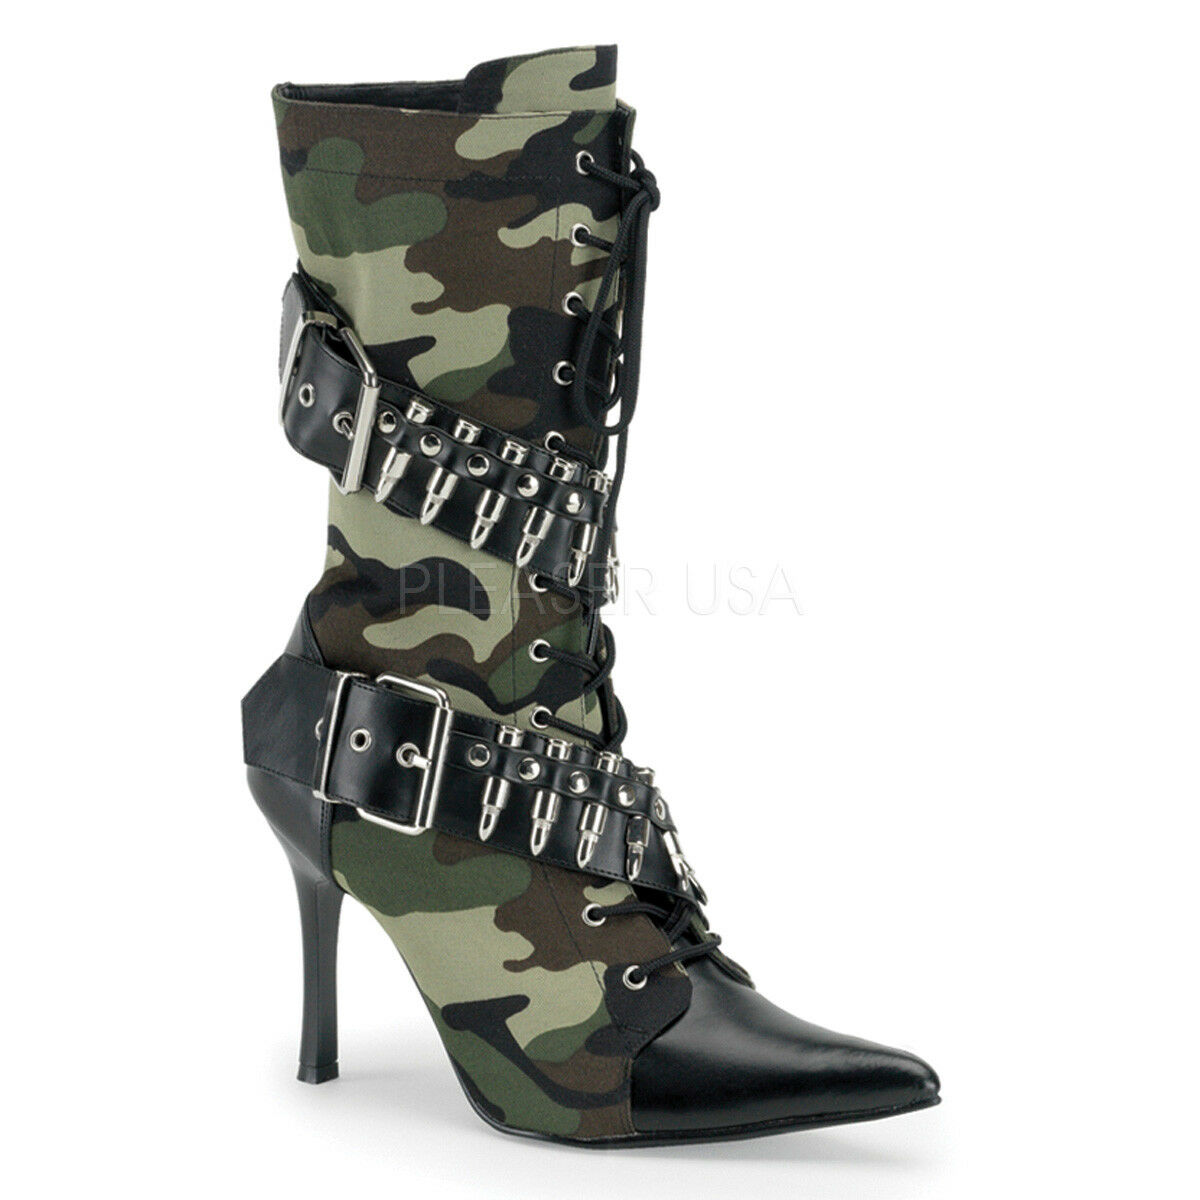 PLEASER FUNTASMA Militant-128 Camouflage Military Cosplay Mid Calf Boots